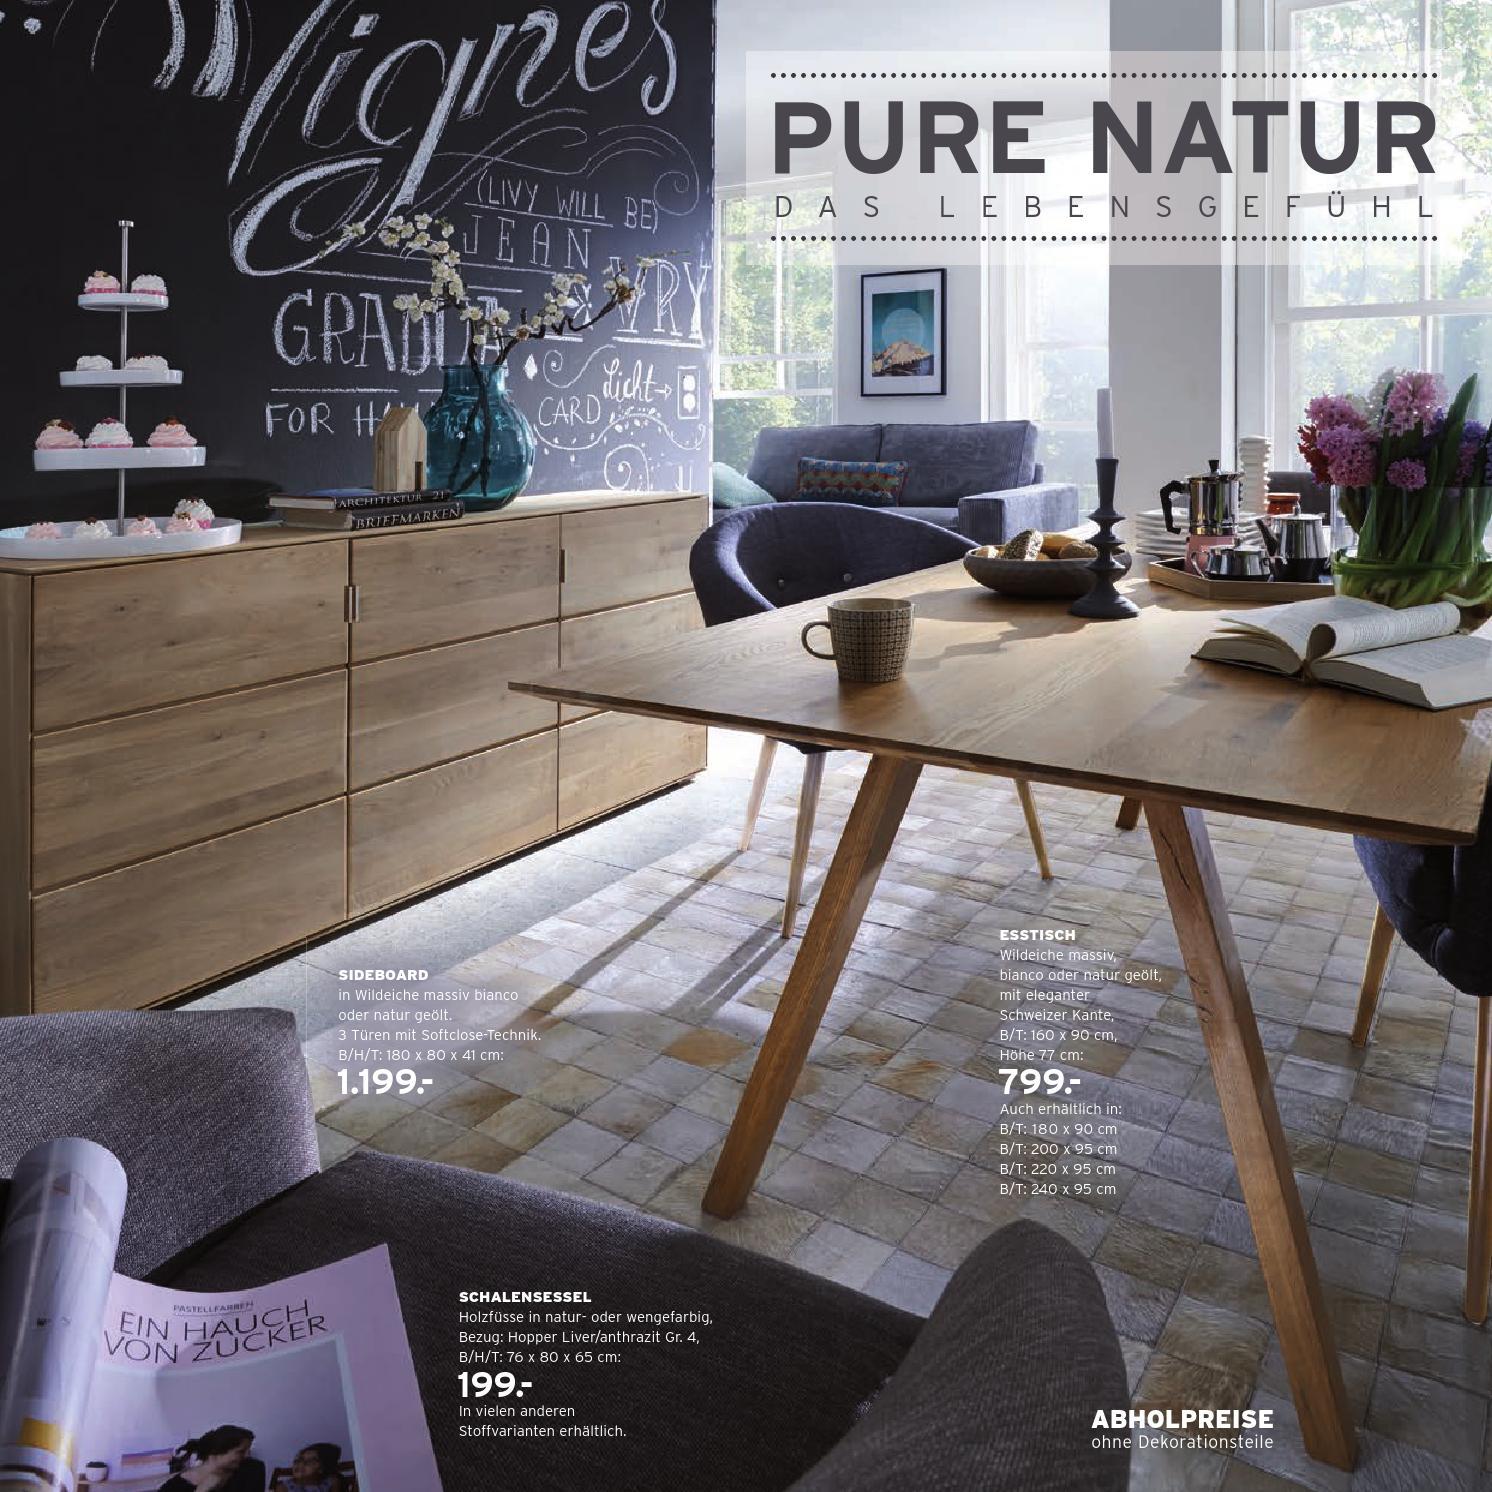 Full Size of Pure Natur Hempel 2015 By Perspektive Werbeagentur Modulküche Ikea Holz Wohnzimmer Cocoon Modulküche